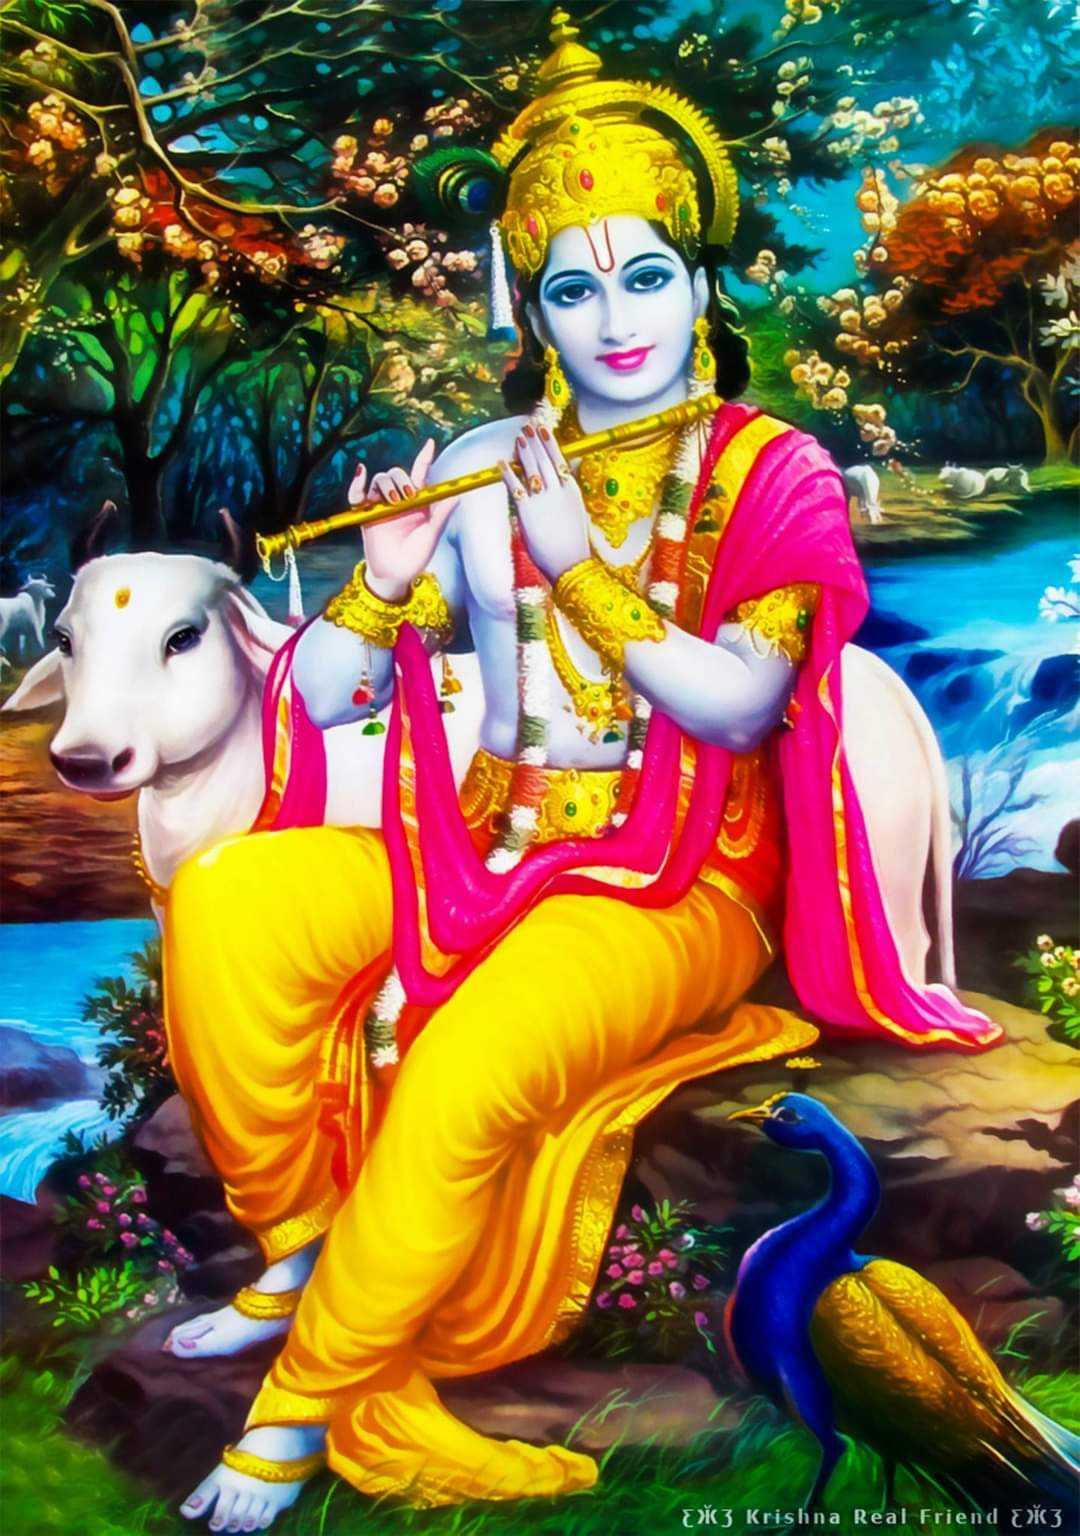 Find Krishna Wallpaper HD Wallpapers - Find Krishna Wallpaper HD Wallpapers